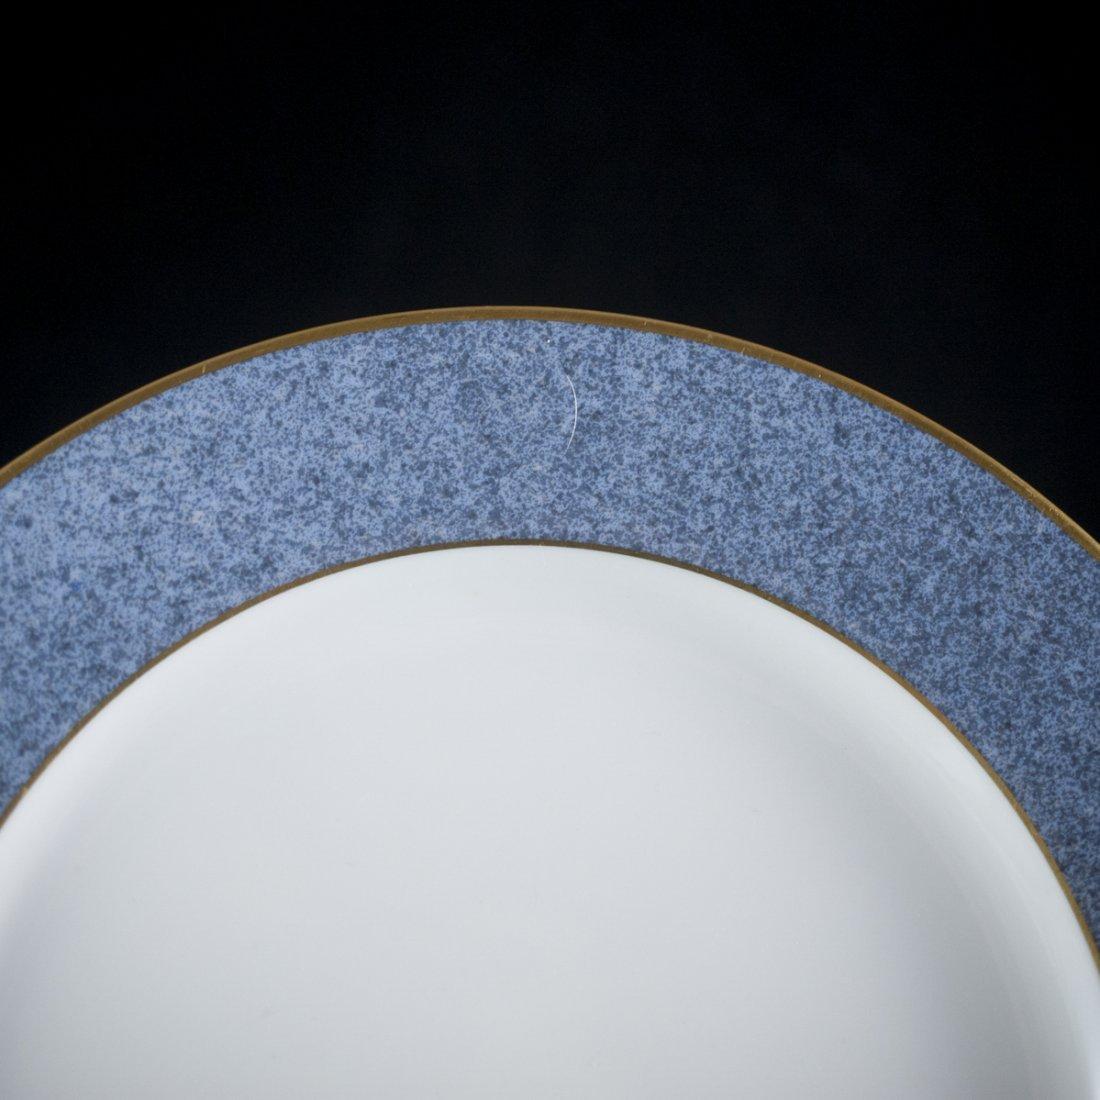 Bernardaud Limoges Porcelain Dinner Plates - 2